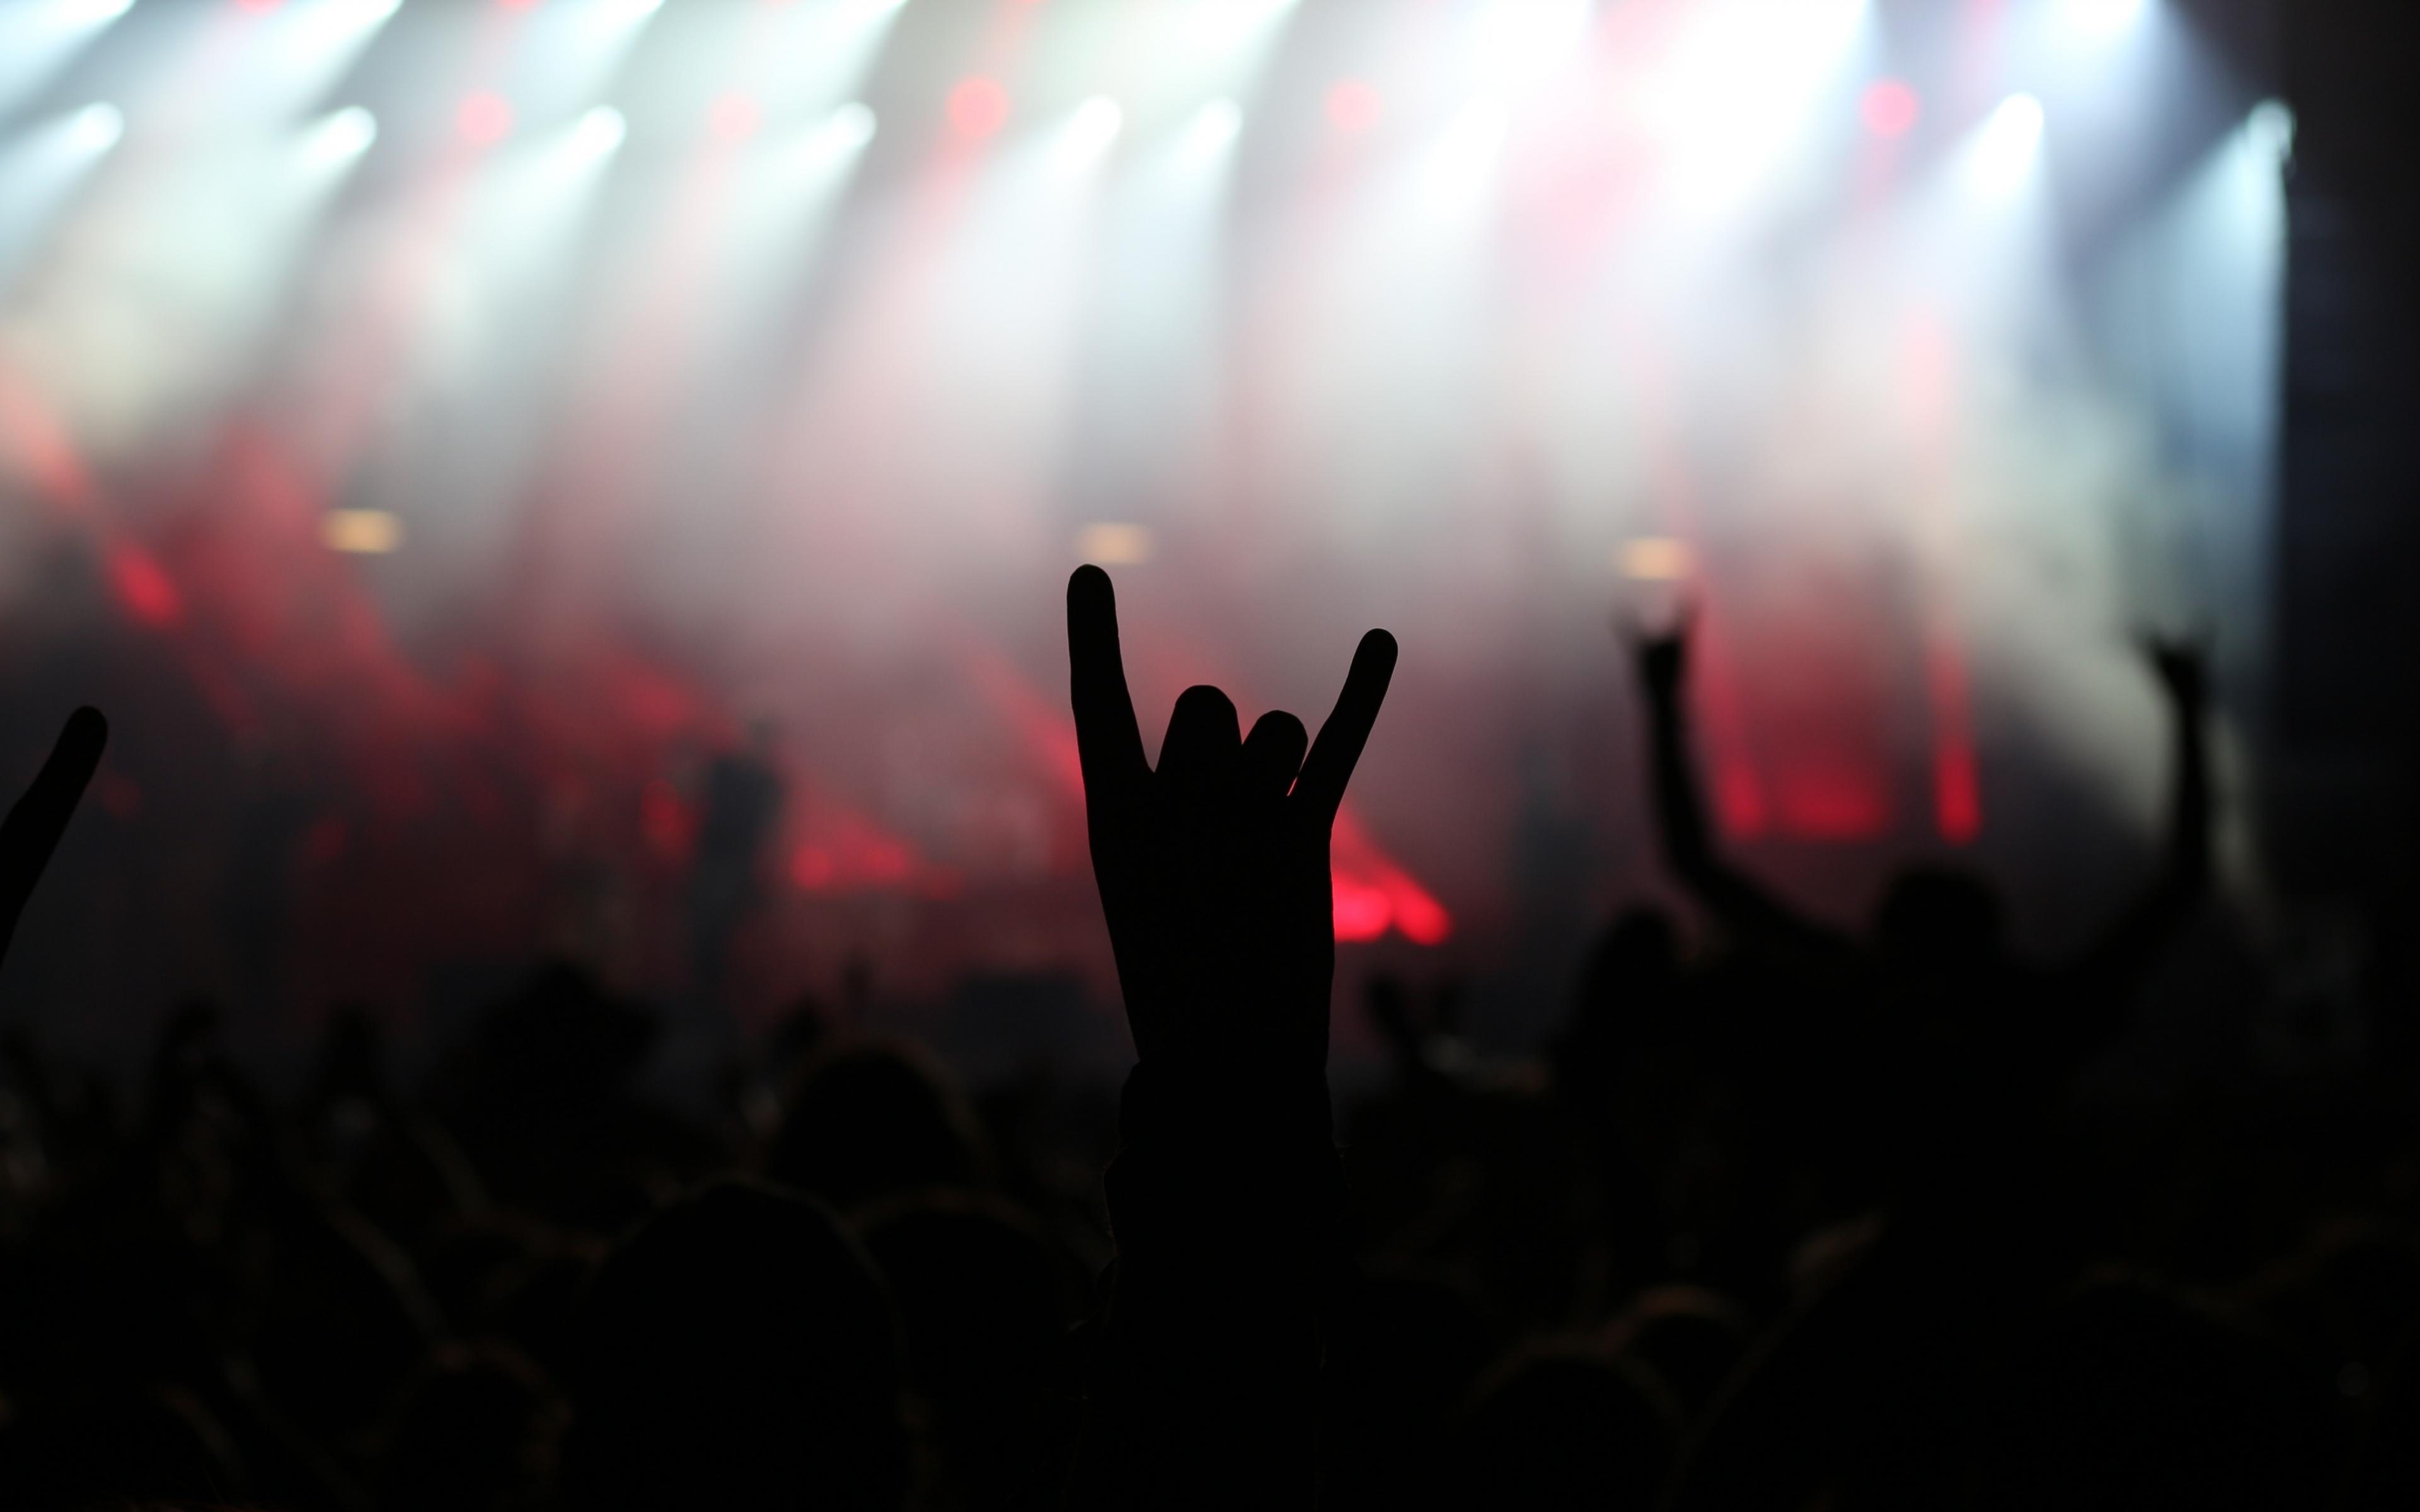 Rock party, music concert, dance, hands, party, 3840x2400 wallpaper